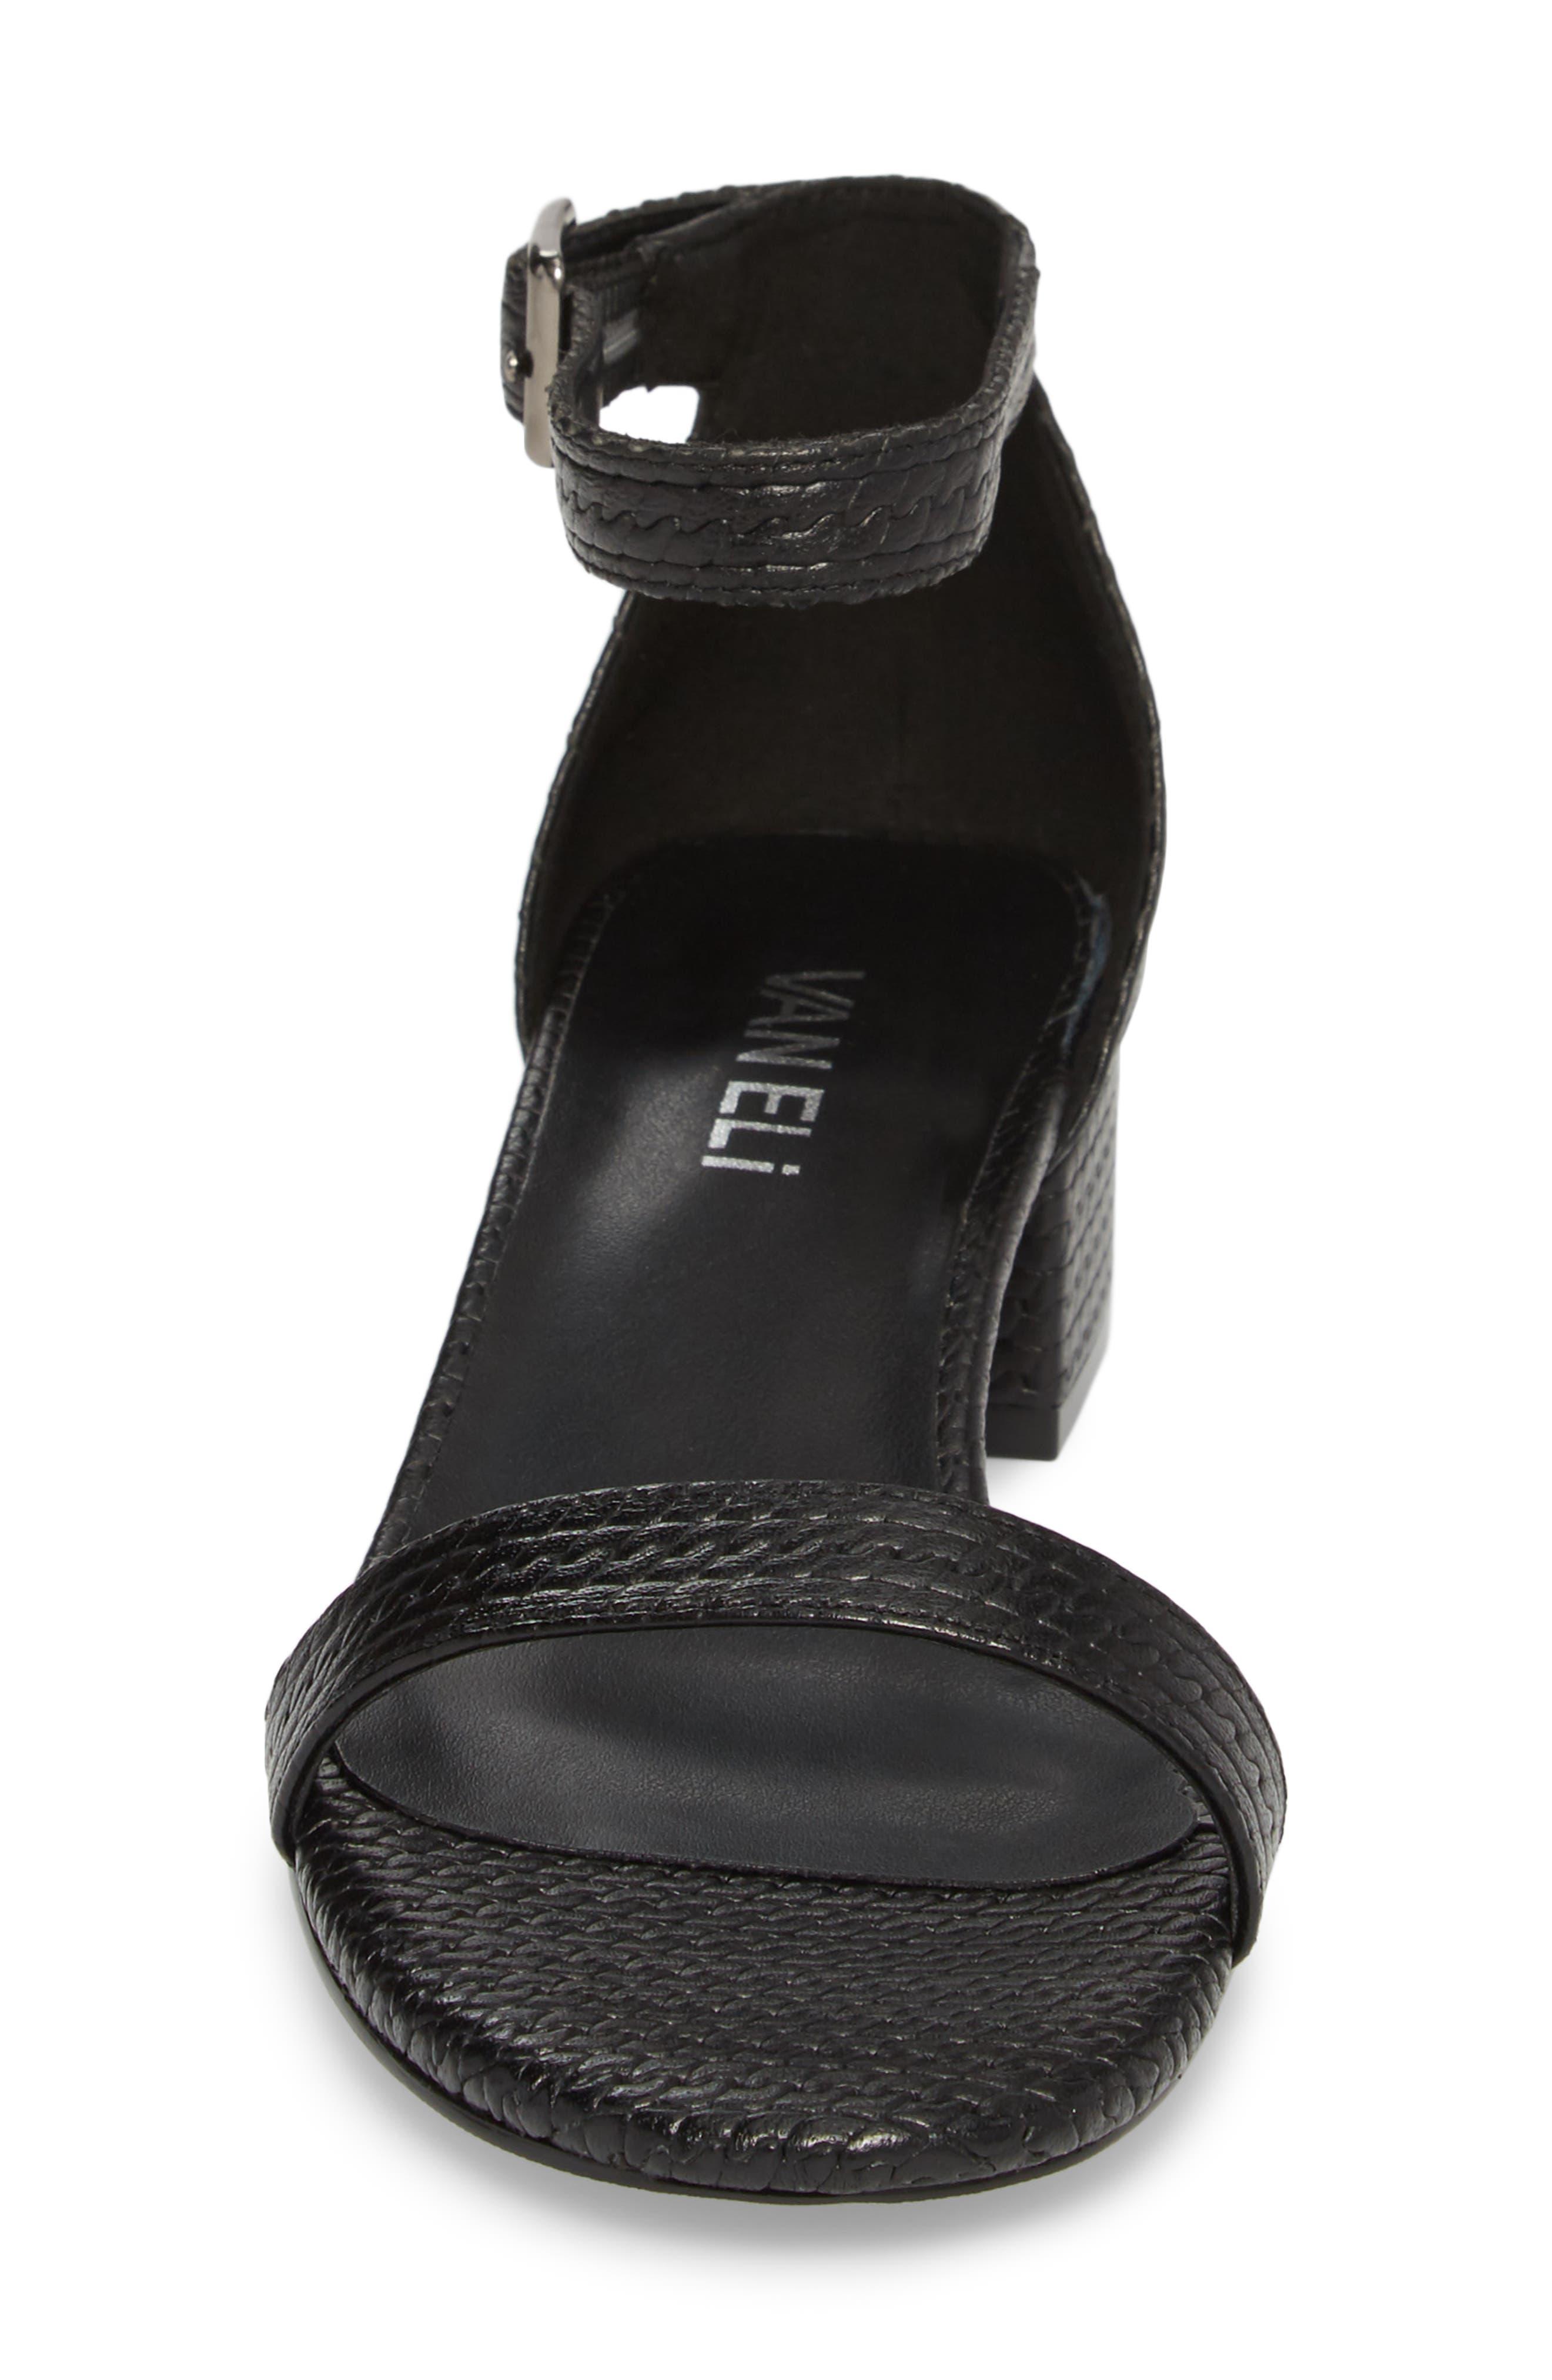 Hirin Sandal,                             Alternate thumbnail 4, color,                             Black Printed Leather